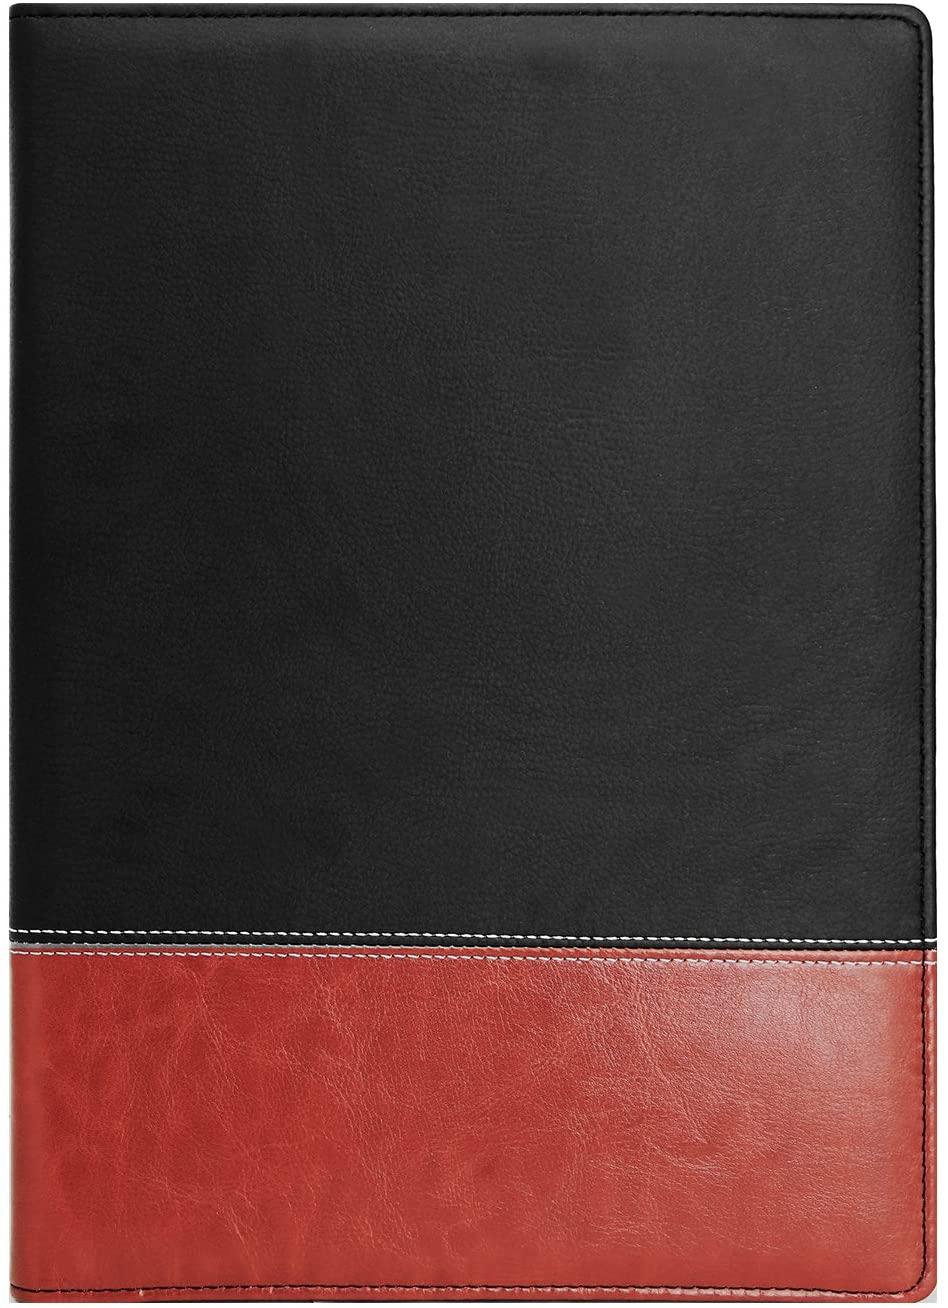 Natico Ring Binder, Portfolio, Padfolio Two-Tone 13 x 9.125 (60-PF-14)